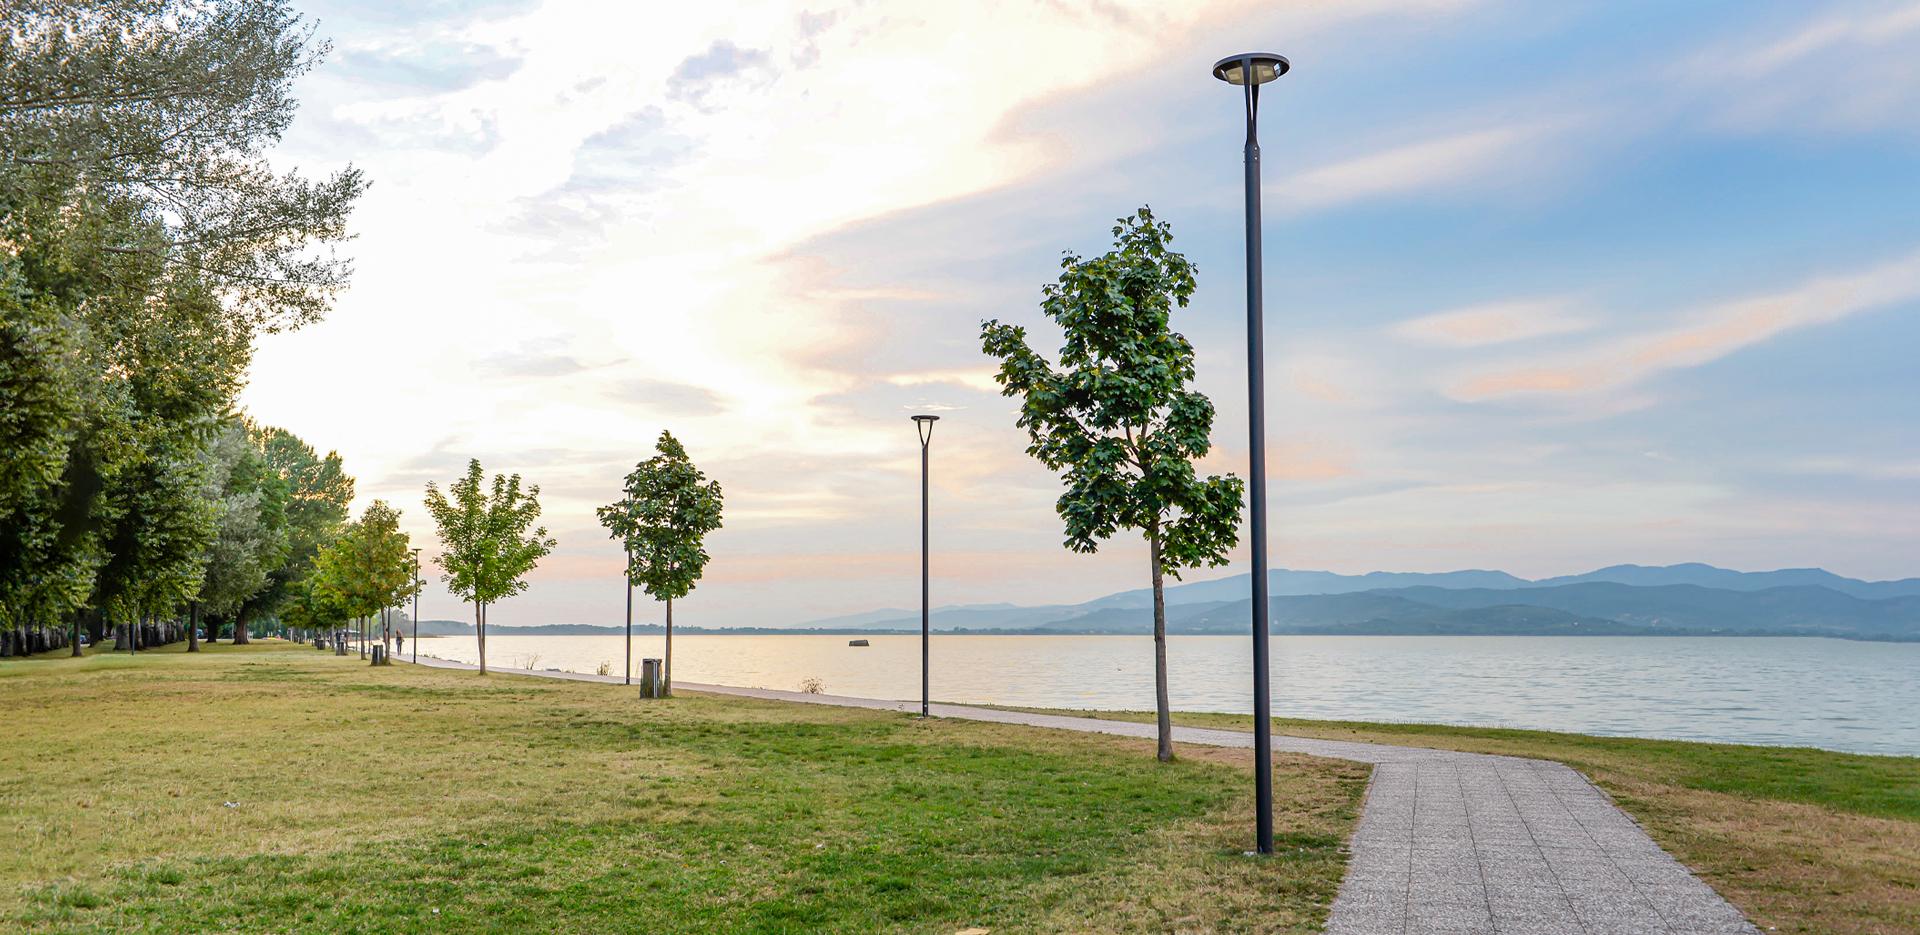 Lampione urbano a LED